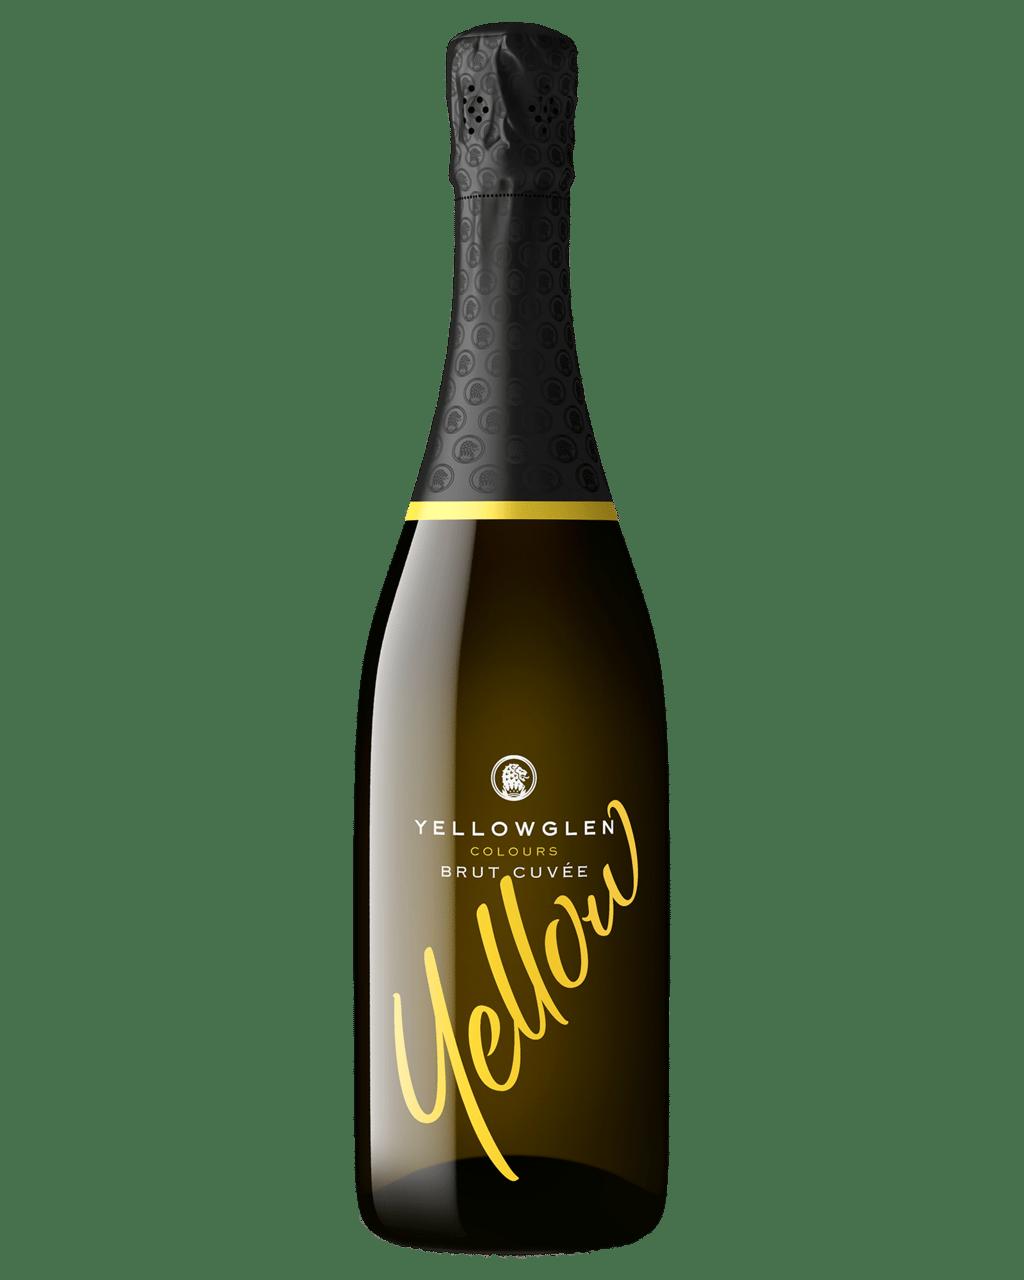 Yellowglen Yellow Dan Murphys Buy Wine Champagne Beer